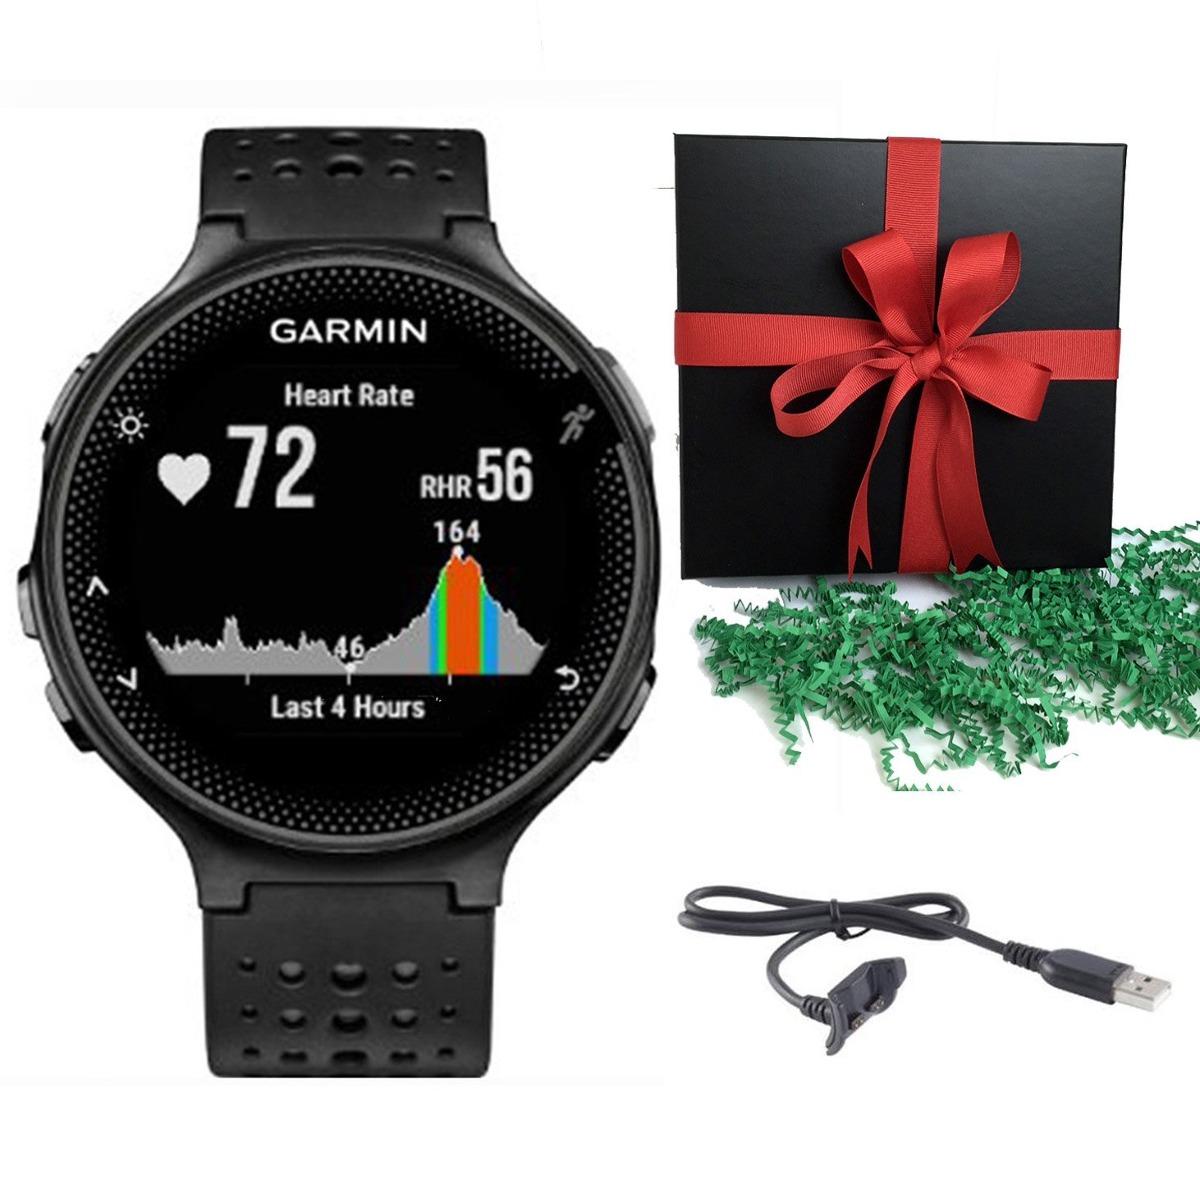 08a8236b6982 paquete  reloj deportivo garmin forerunner 235 que ejecut... Cargando zoom.